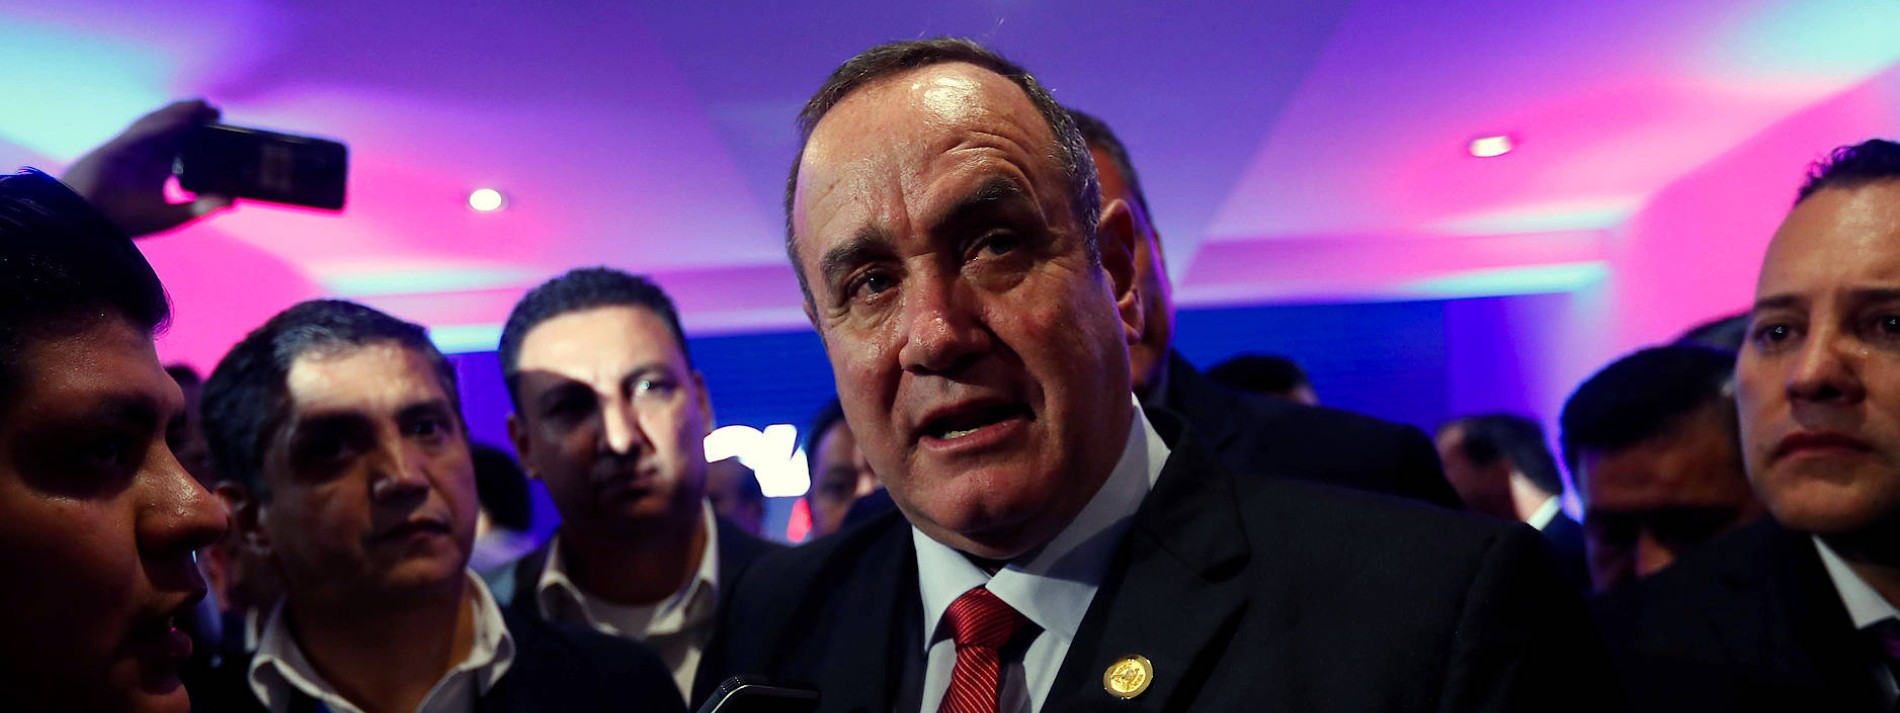 Konservativer Giammattei wird neuer Präsident Guatemalas